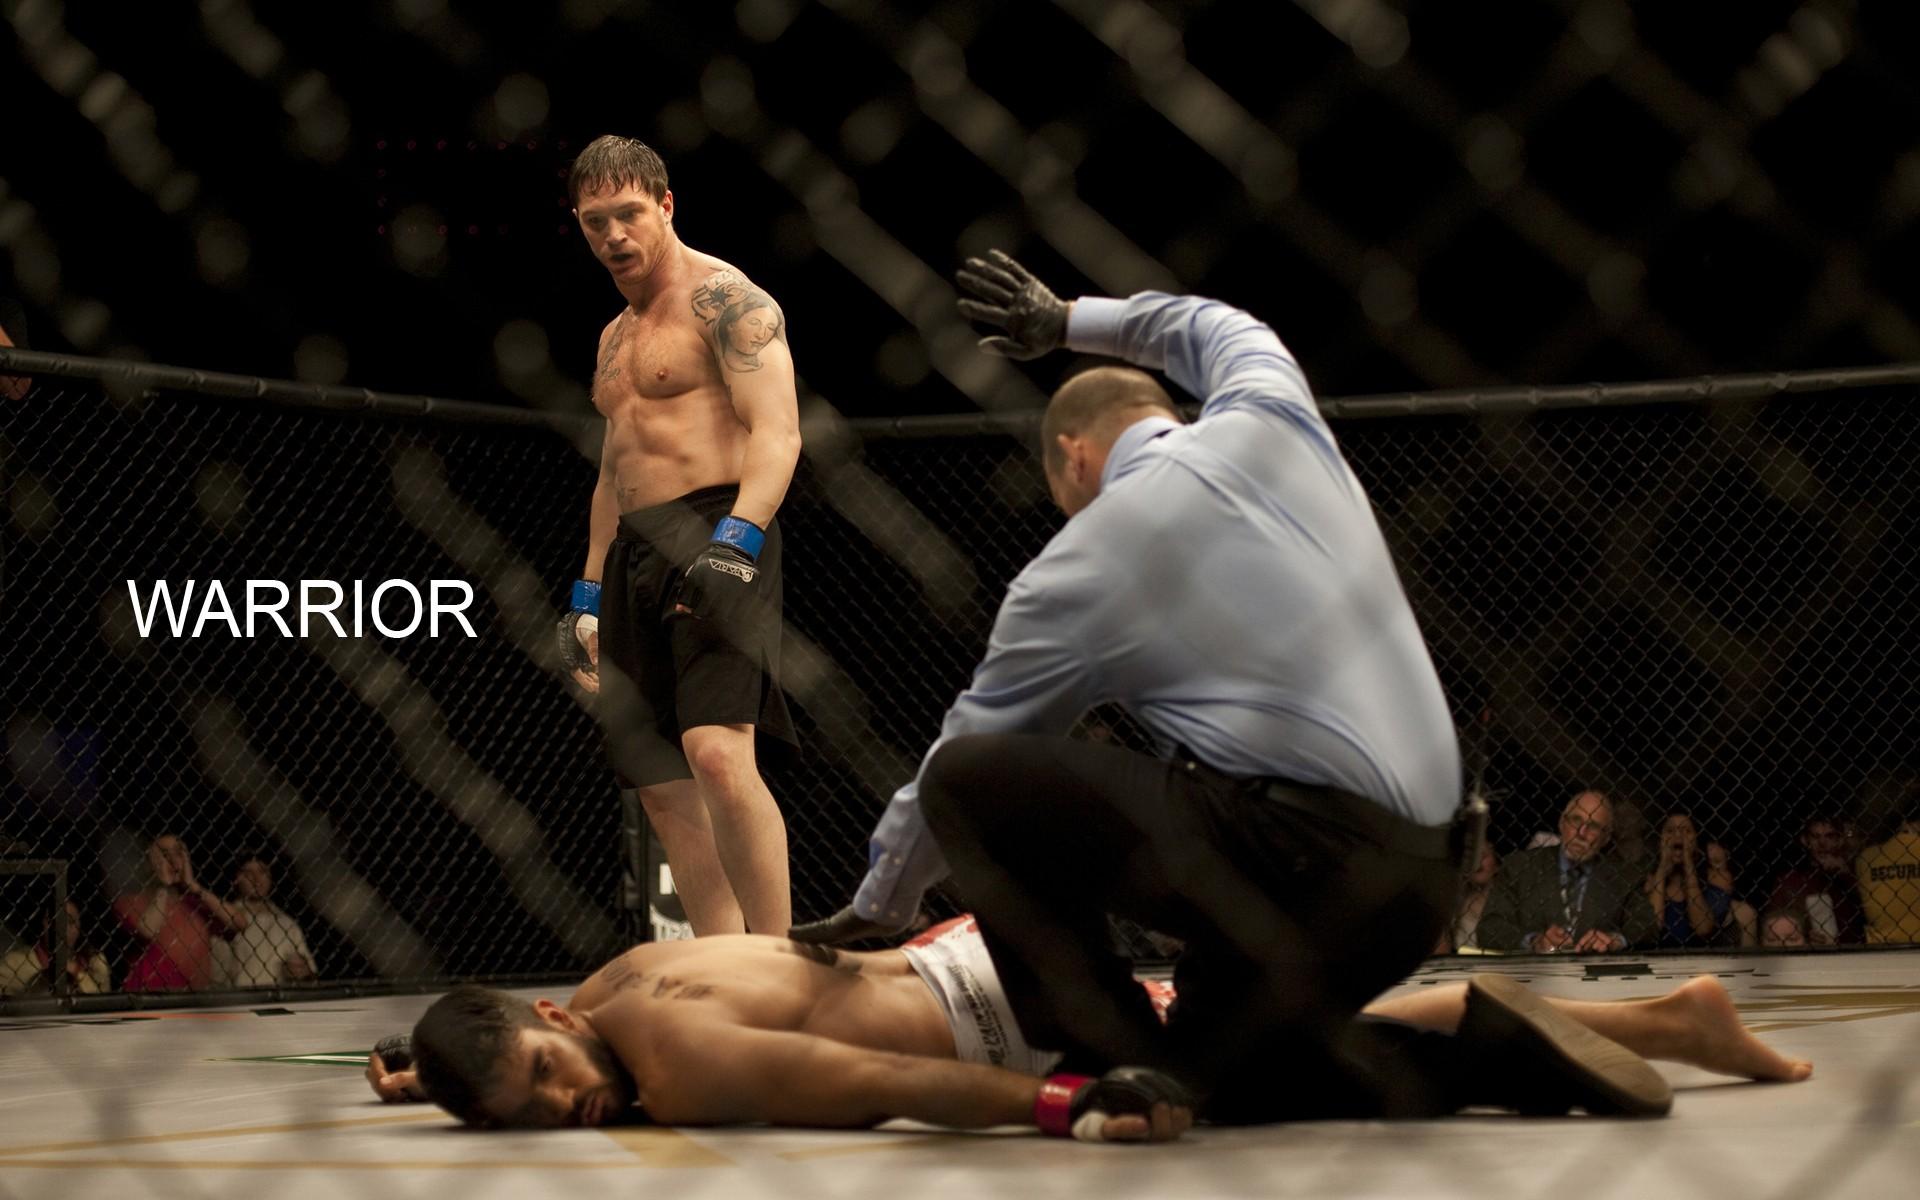 Warrior UFC Wallpapers Warrior UFC HD Wallpapers Warrior UFC 1920x1200